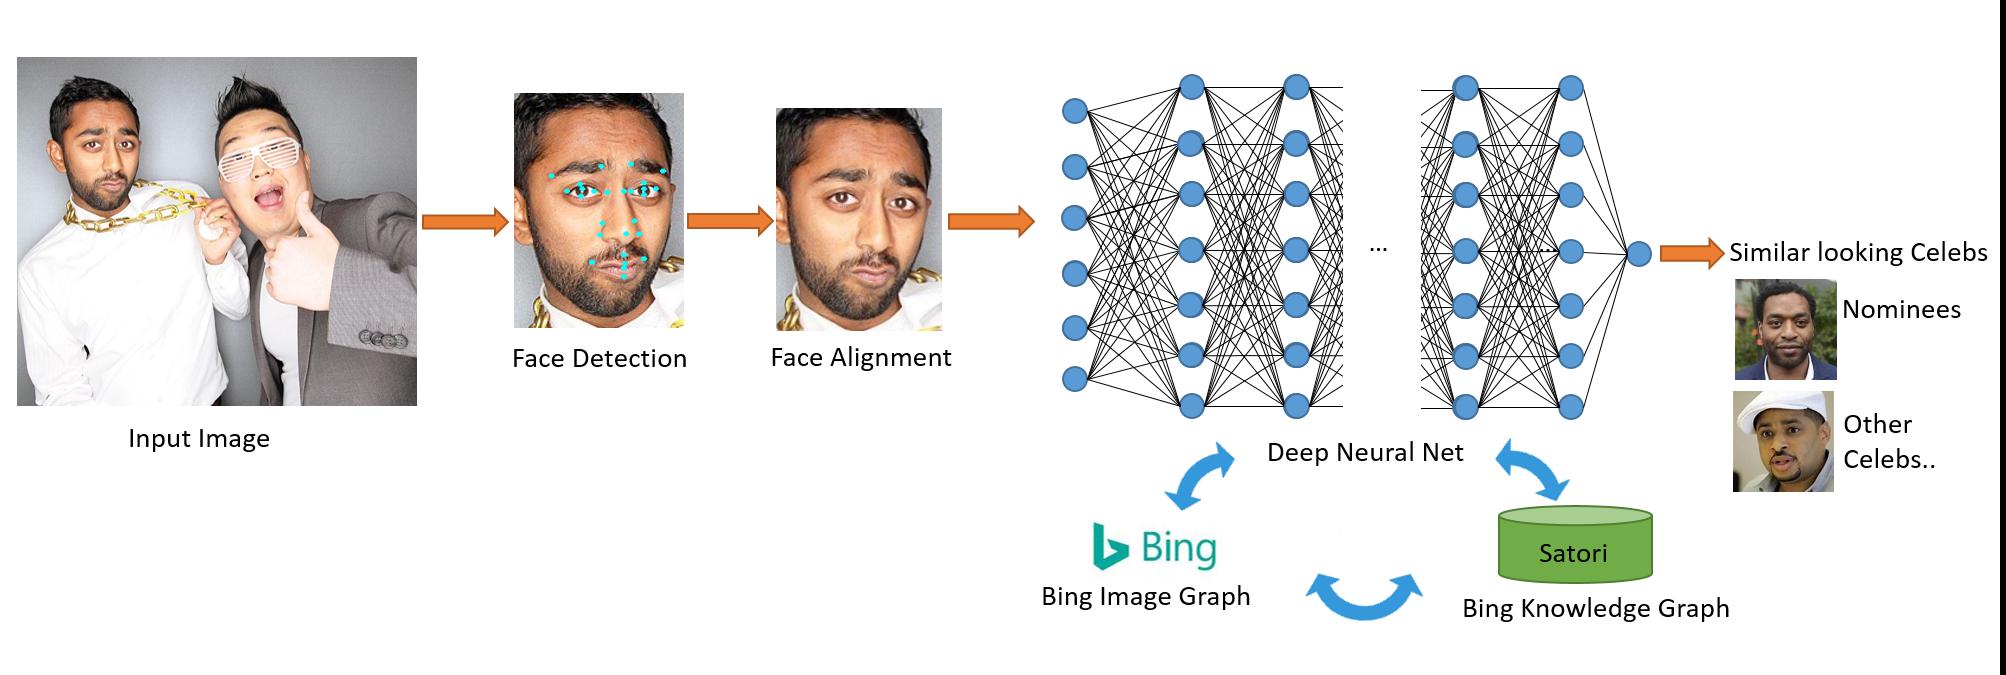 Celebs-like-me-face-detection_2